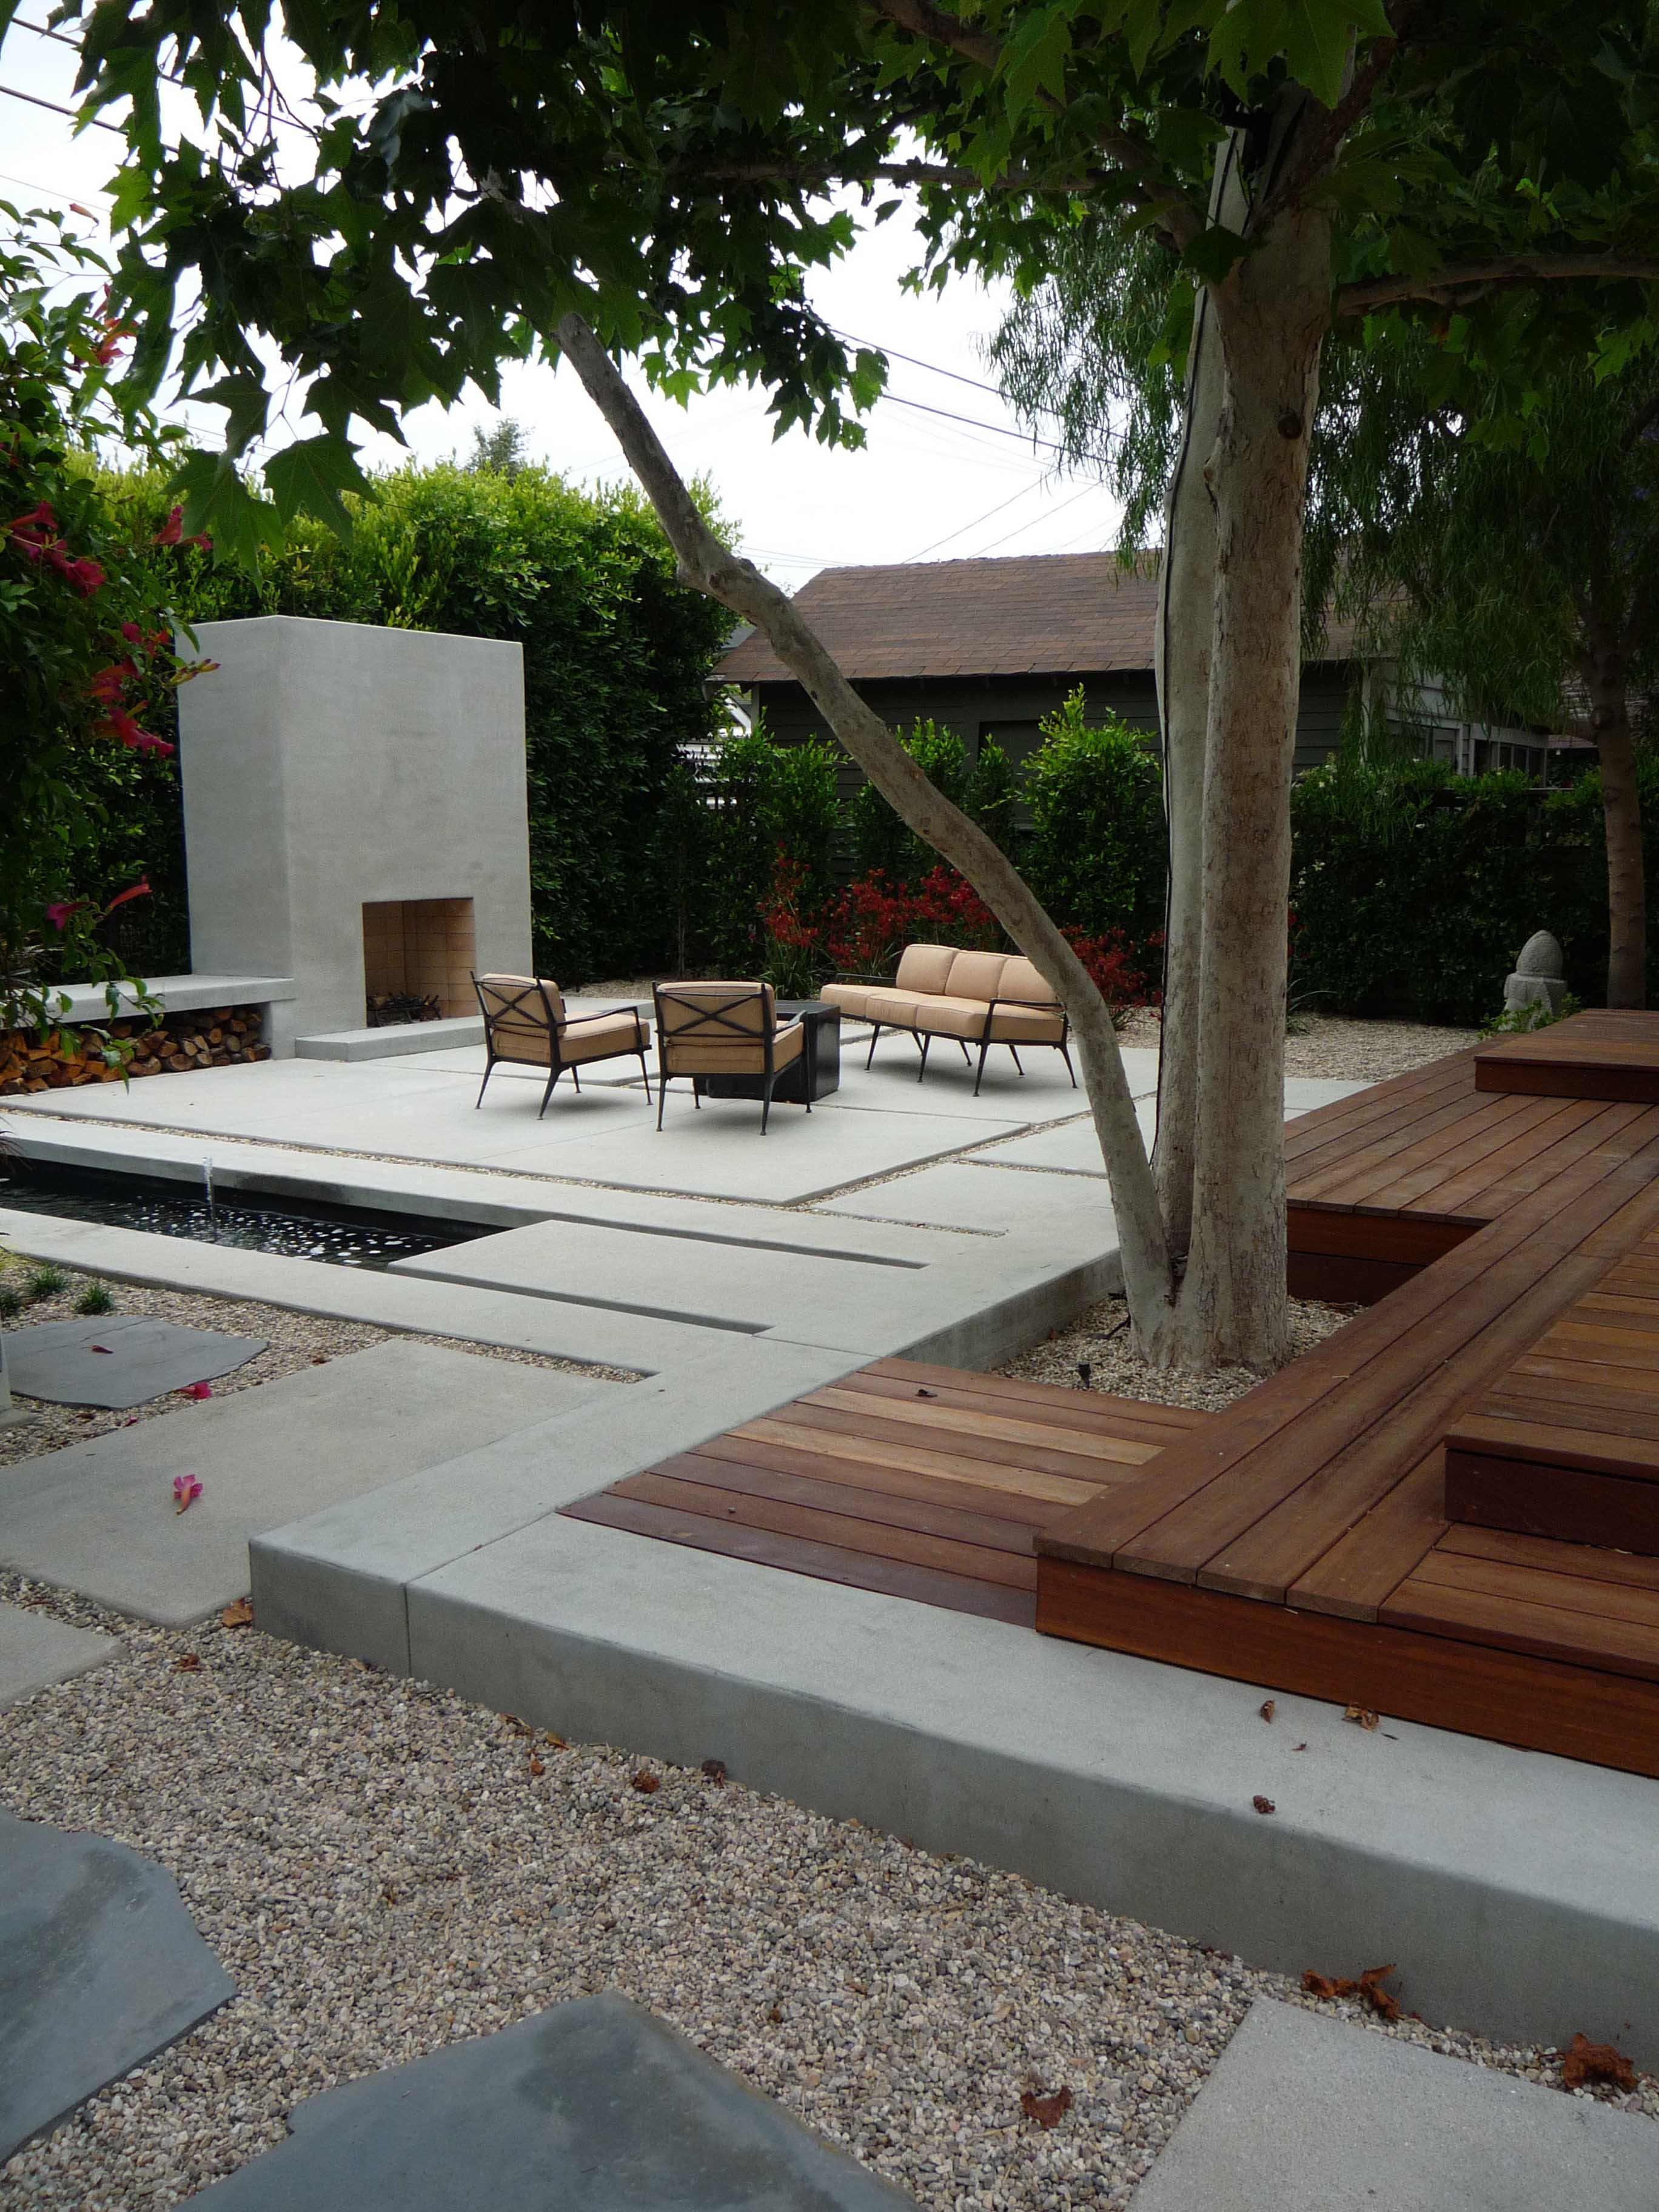 hancock park garden w fireplace water feature kfl s landscapes